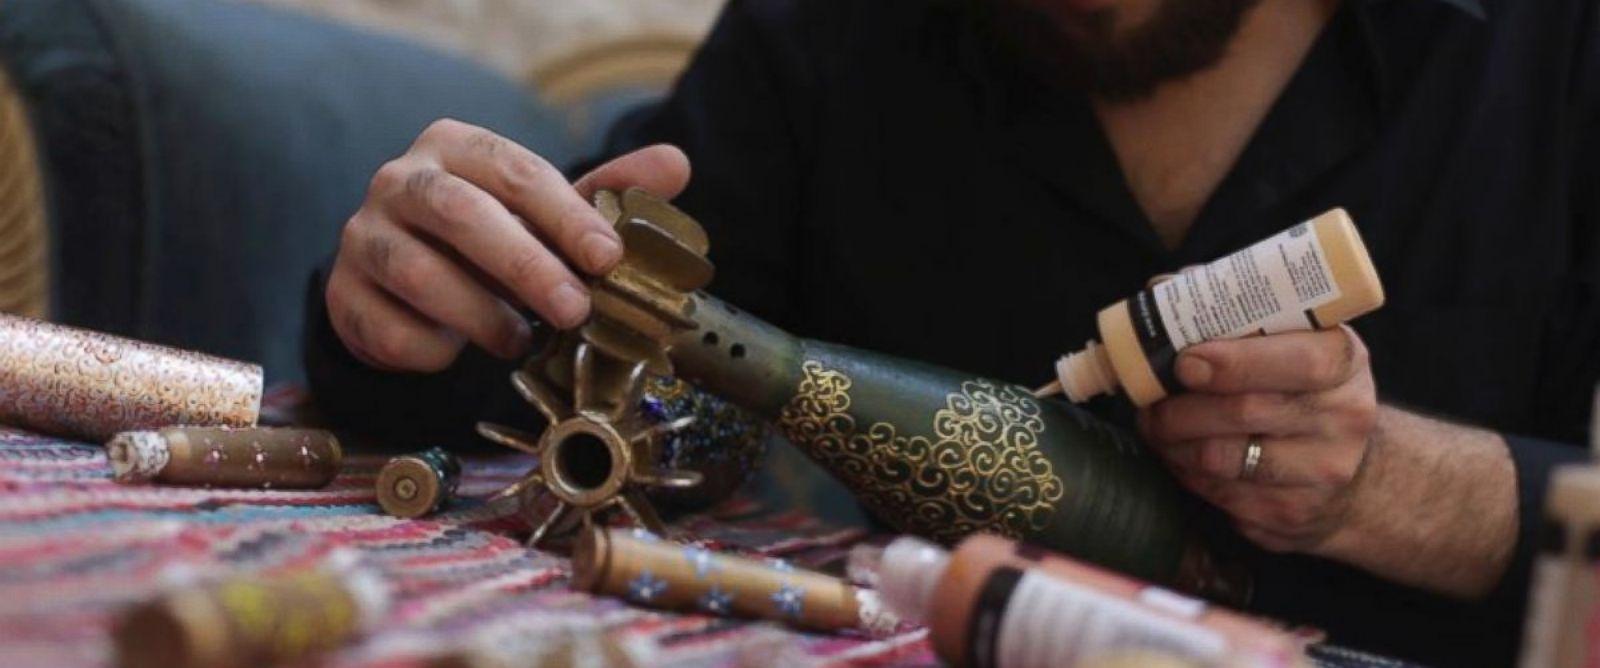 PHOTO: Douma-based artist Akram Abou al-Fouz at work, painting on mortar shells.